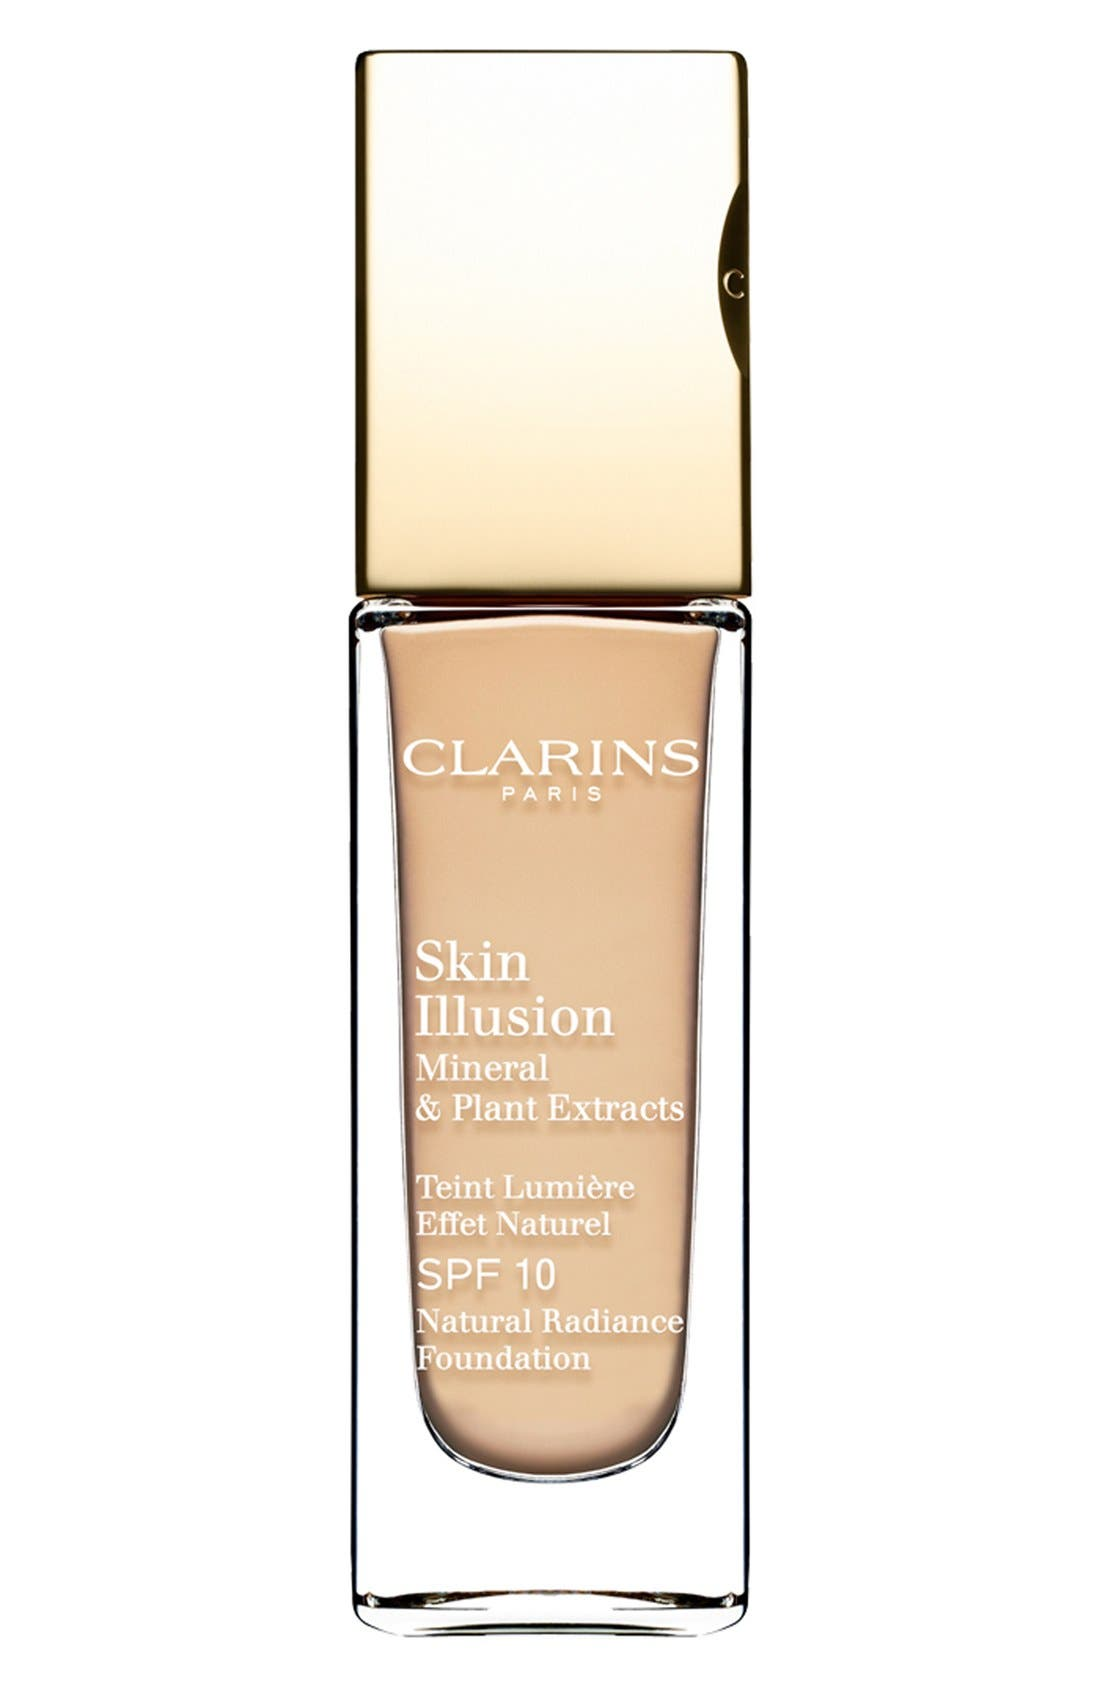 Clarins 'Skin Illusion' Natural Radiance Foundation SPF 10